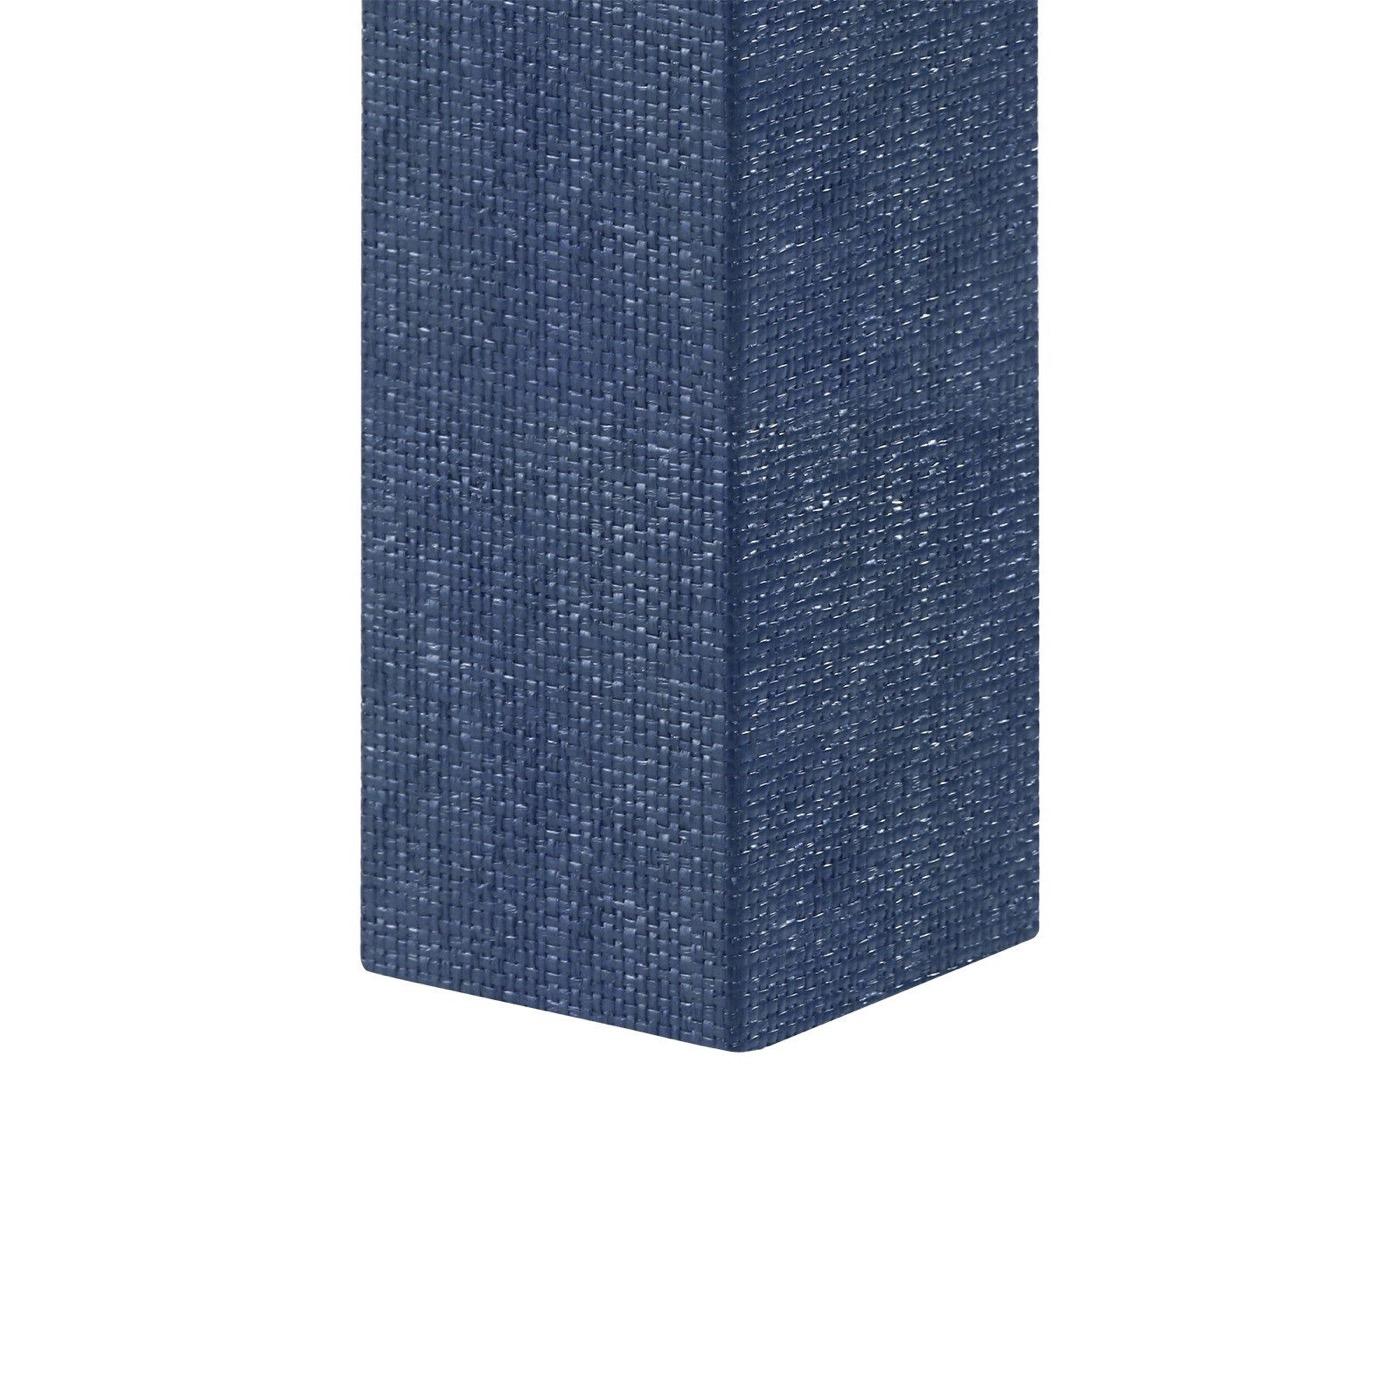 Finn Upholstered Console | Dark Blue